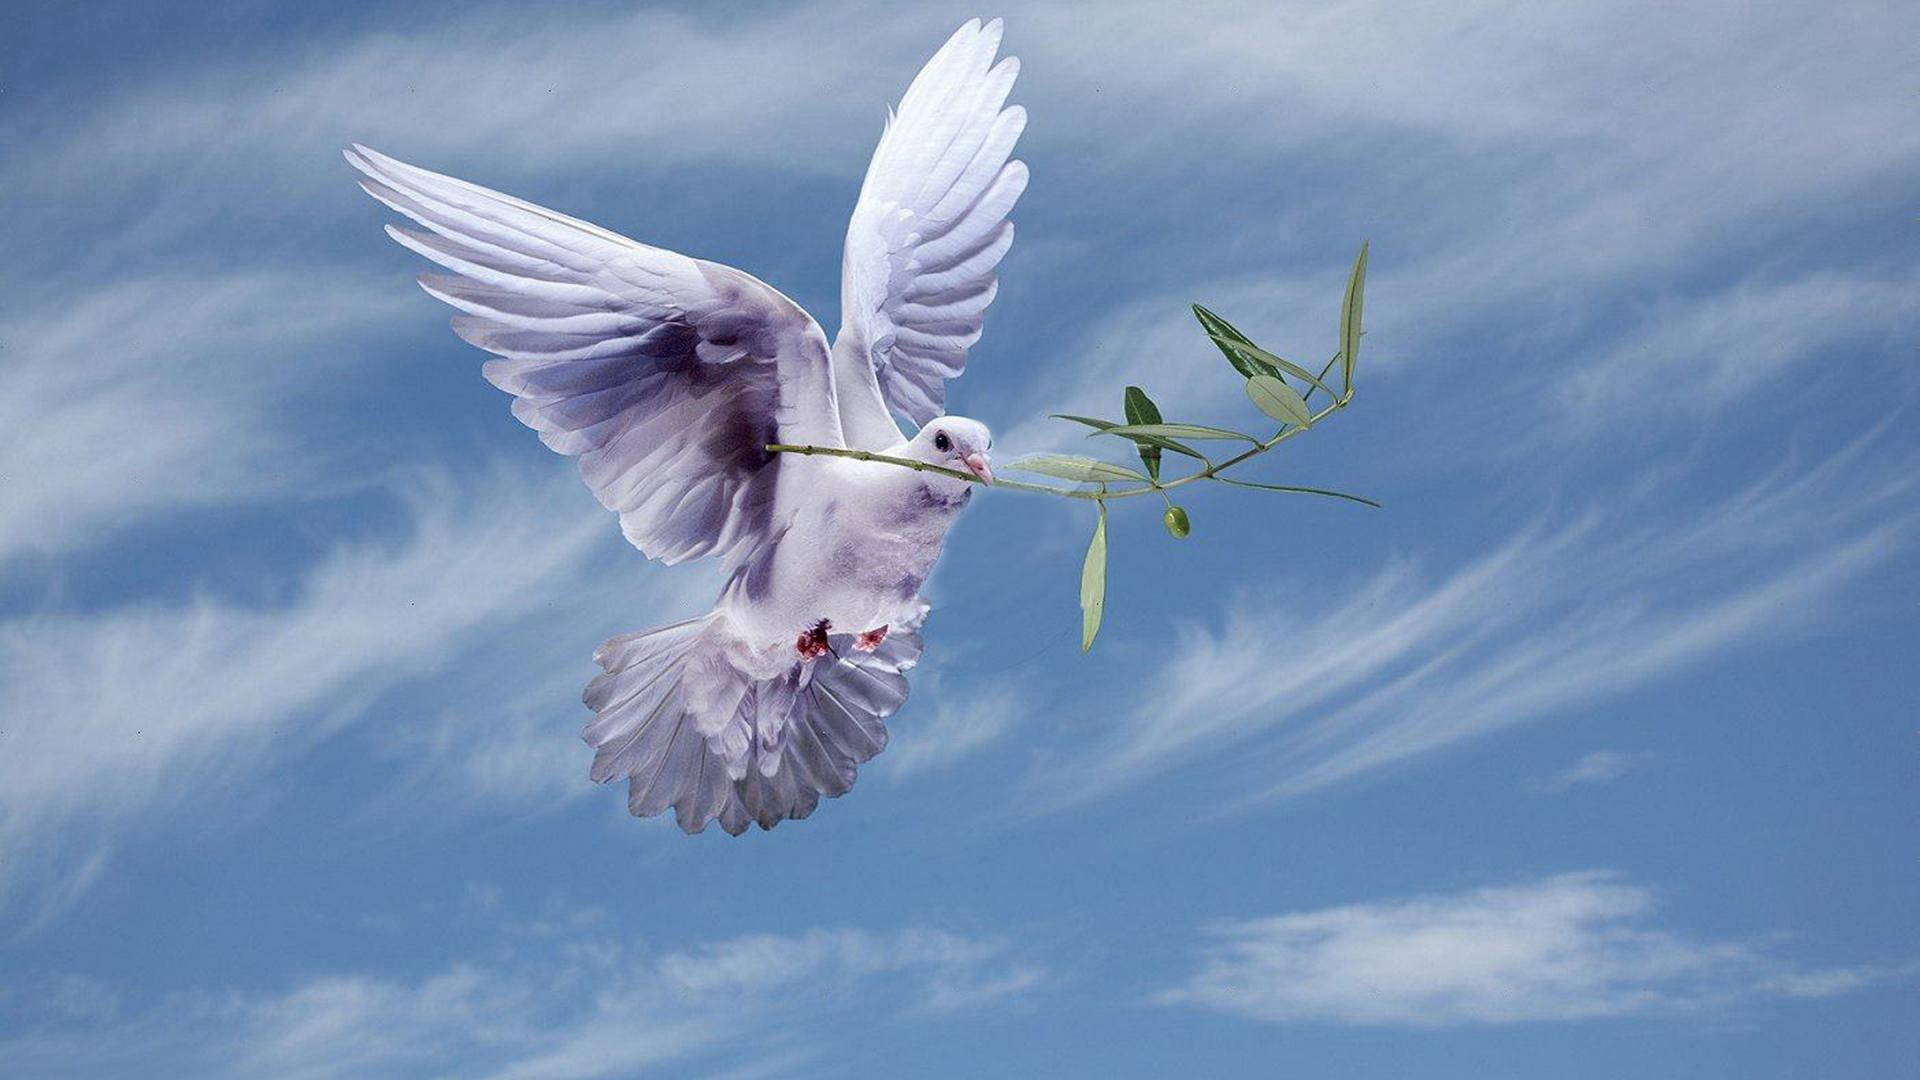 Landscape Portrait - Peace Dove With Olive Branch , HD Wallpaper & Backgrounds